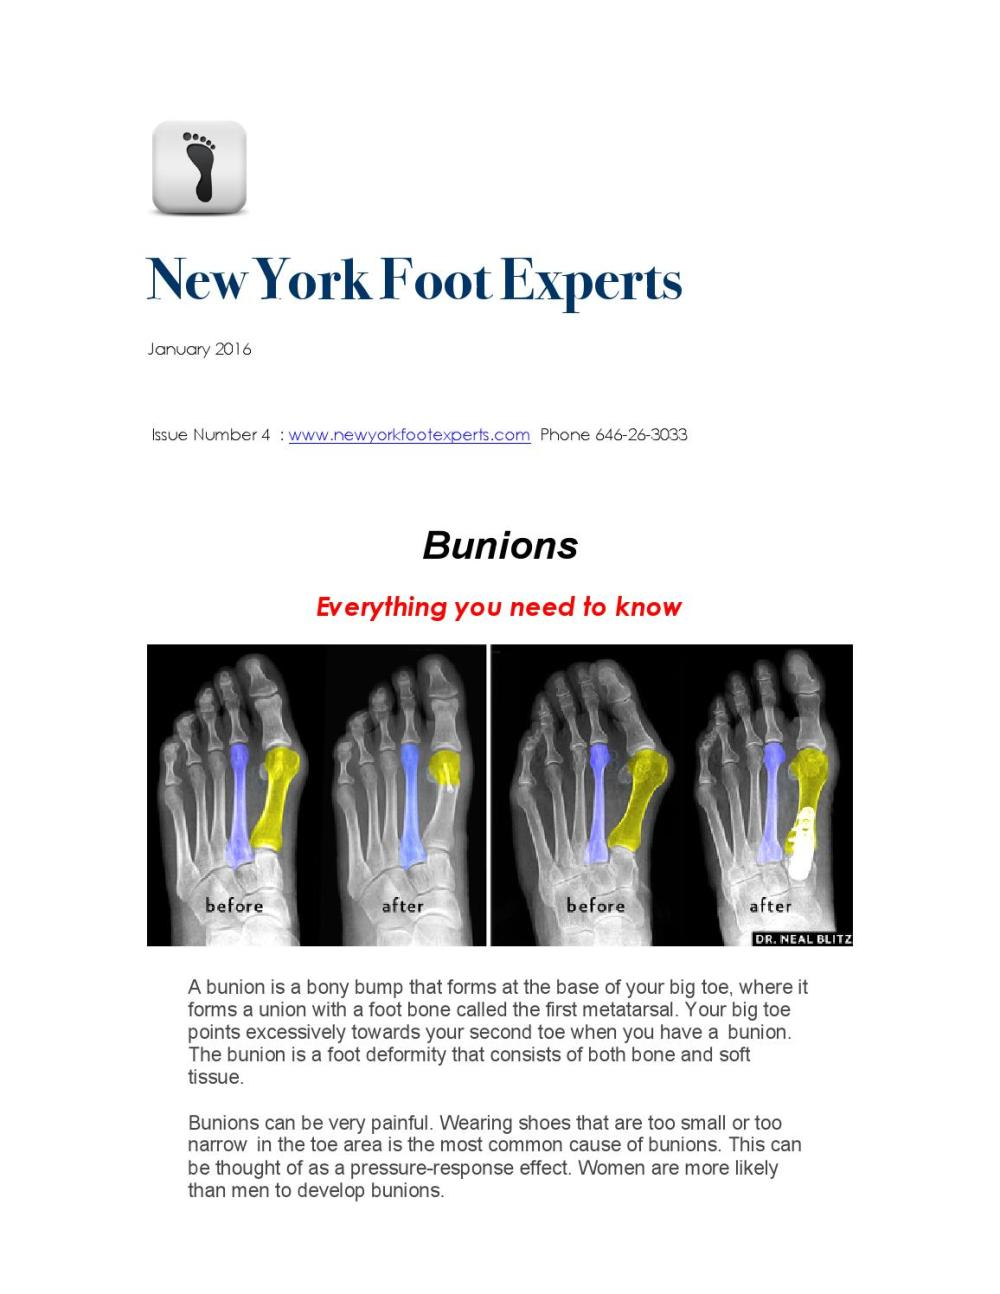 medium resolution of new york foot experts january newsletter bunions